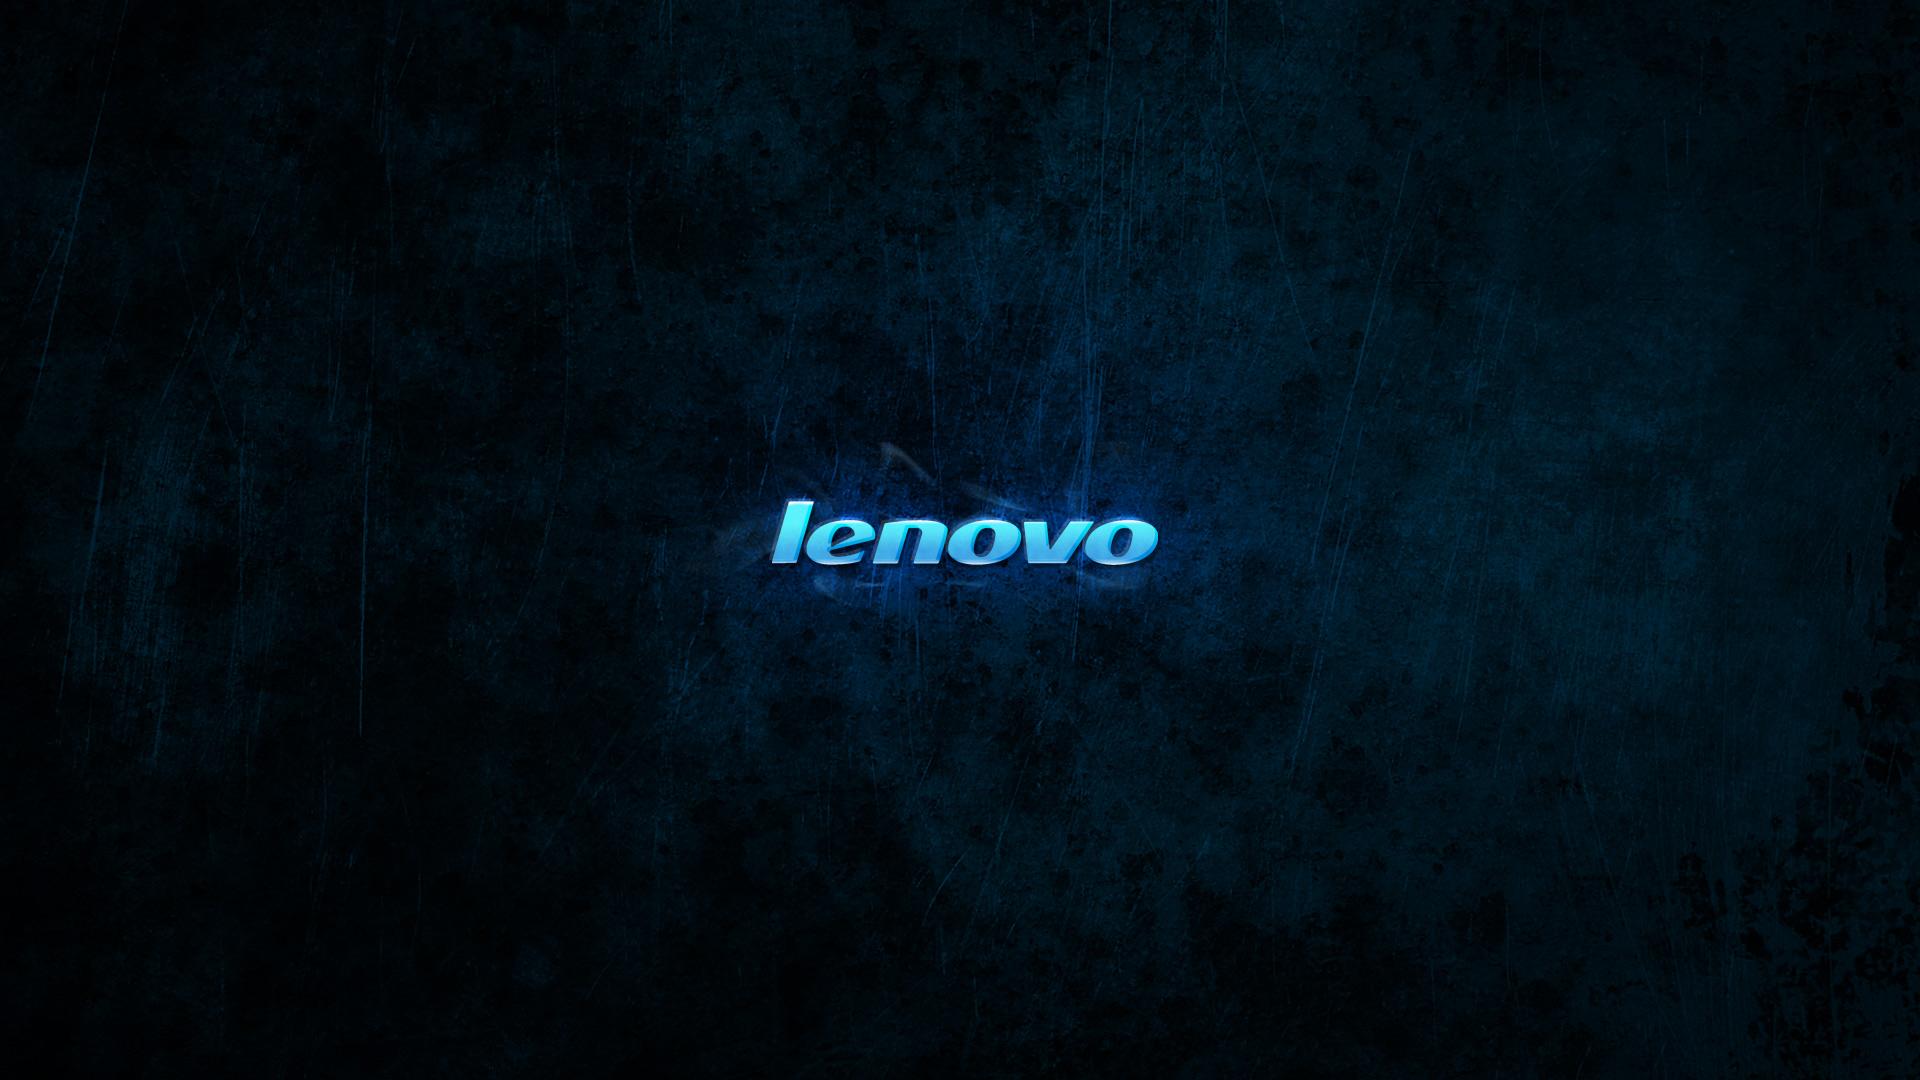 lenovo windows 10 wallpaper wallpapersafari